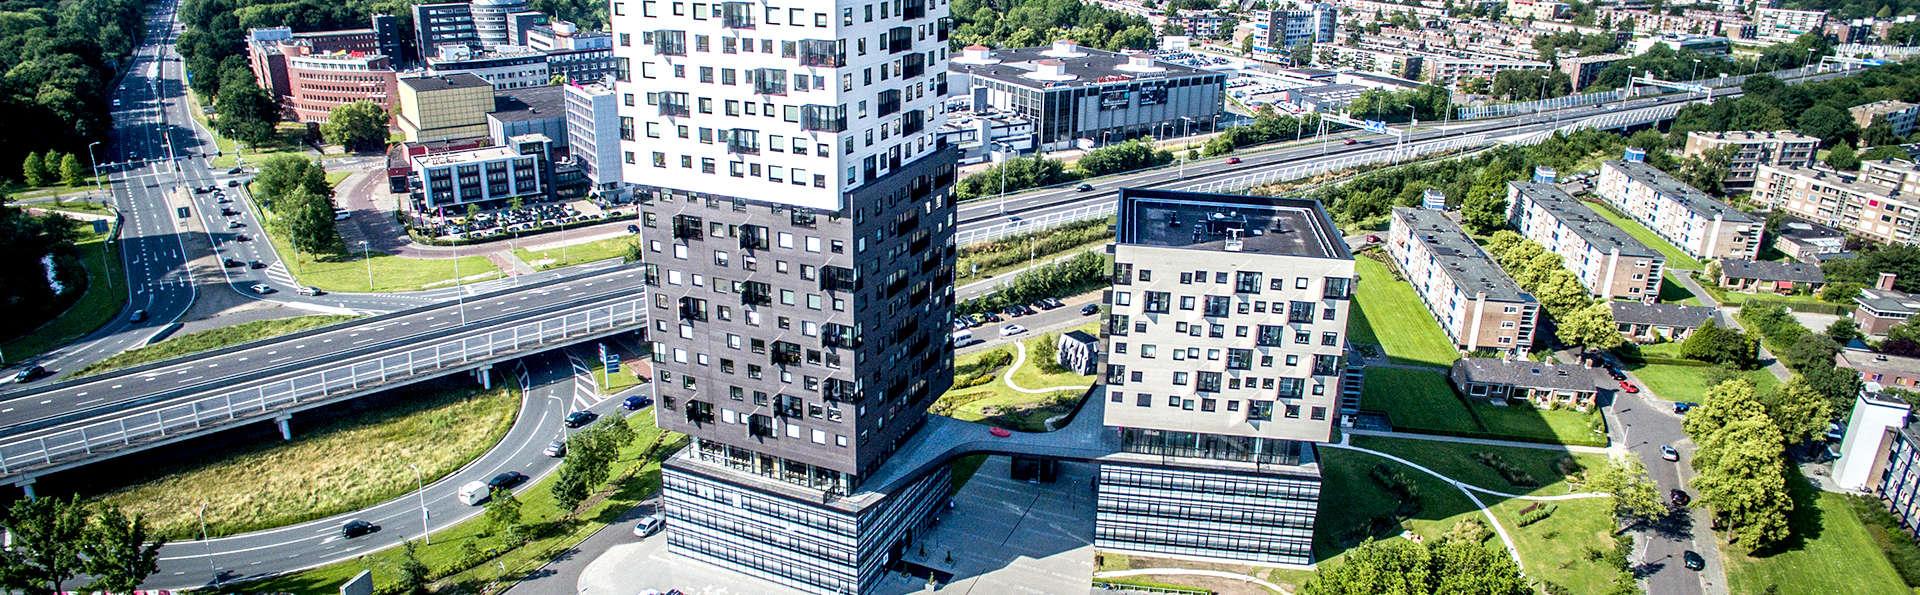 Apollo Hotel Groningen - EDIT_NEW_VIEW.jpg